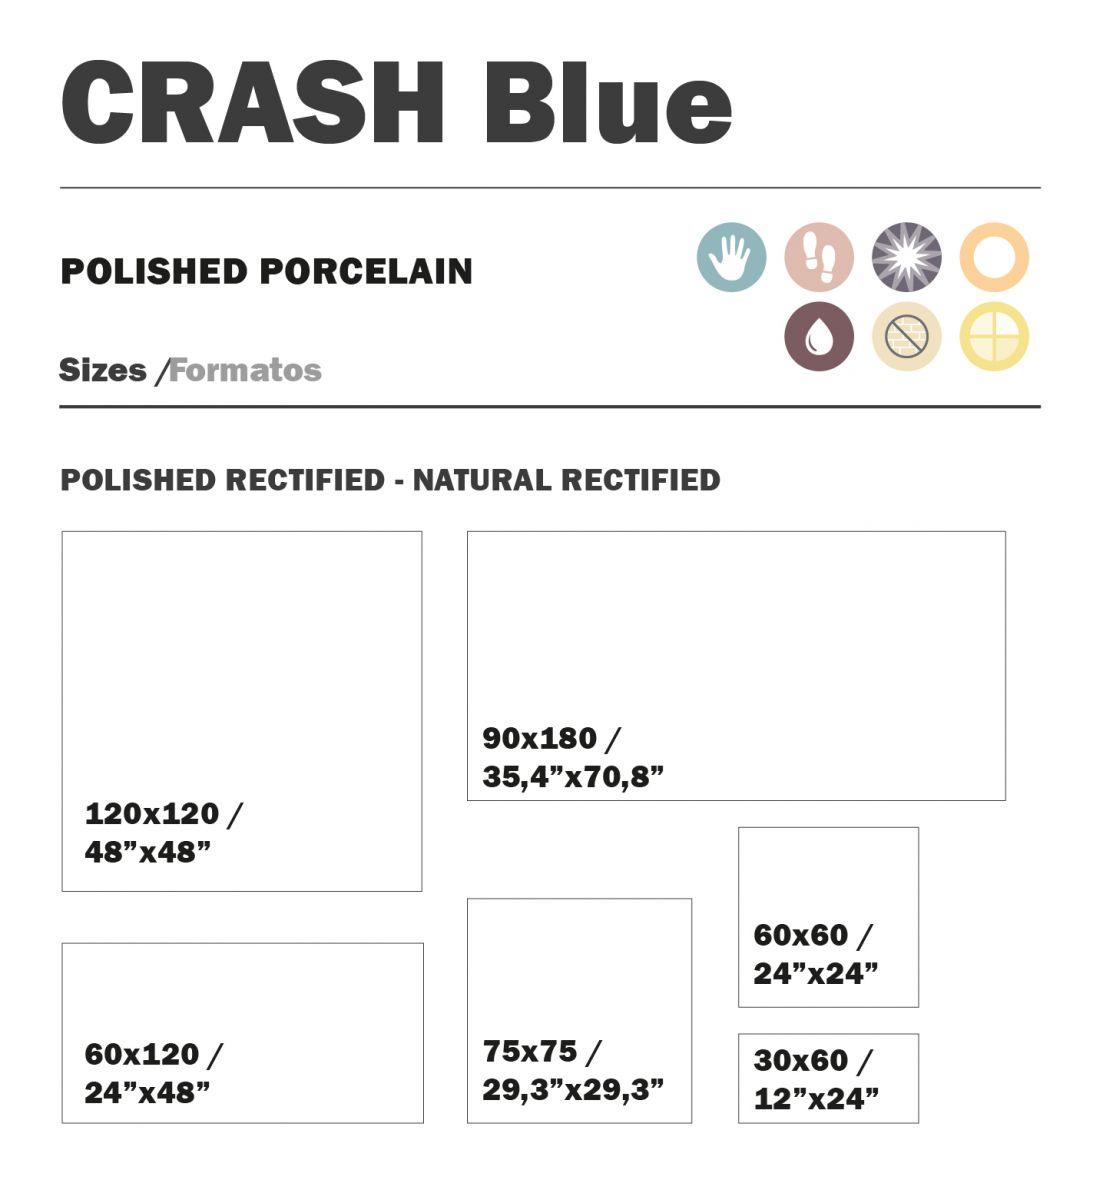 90x180 cm crash blue topkwaliteit spaans tegels